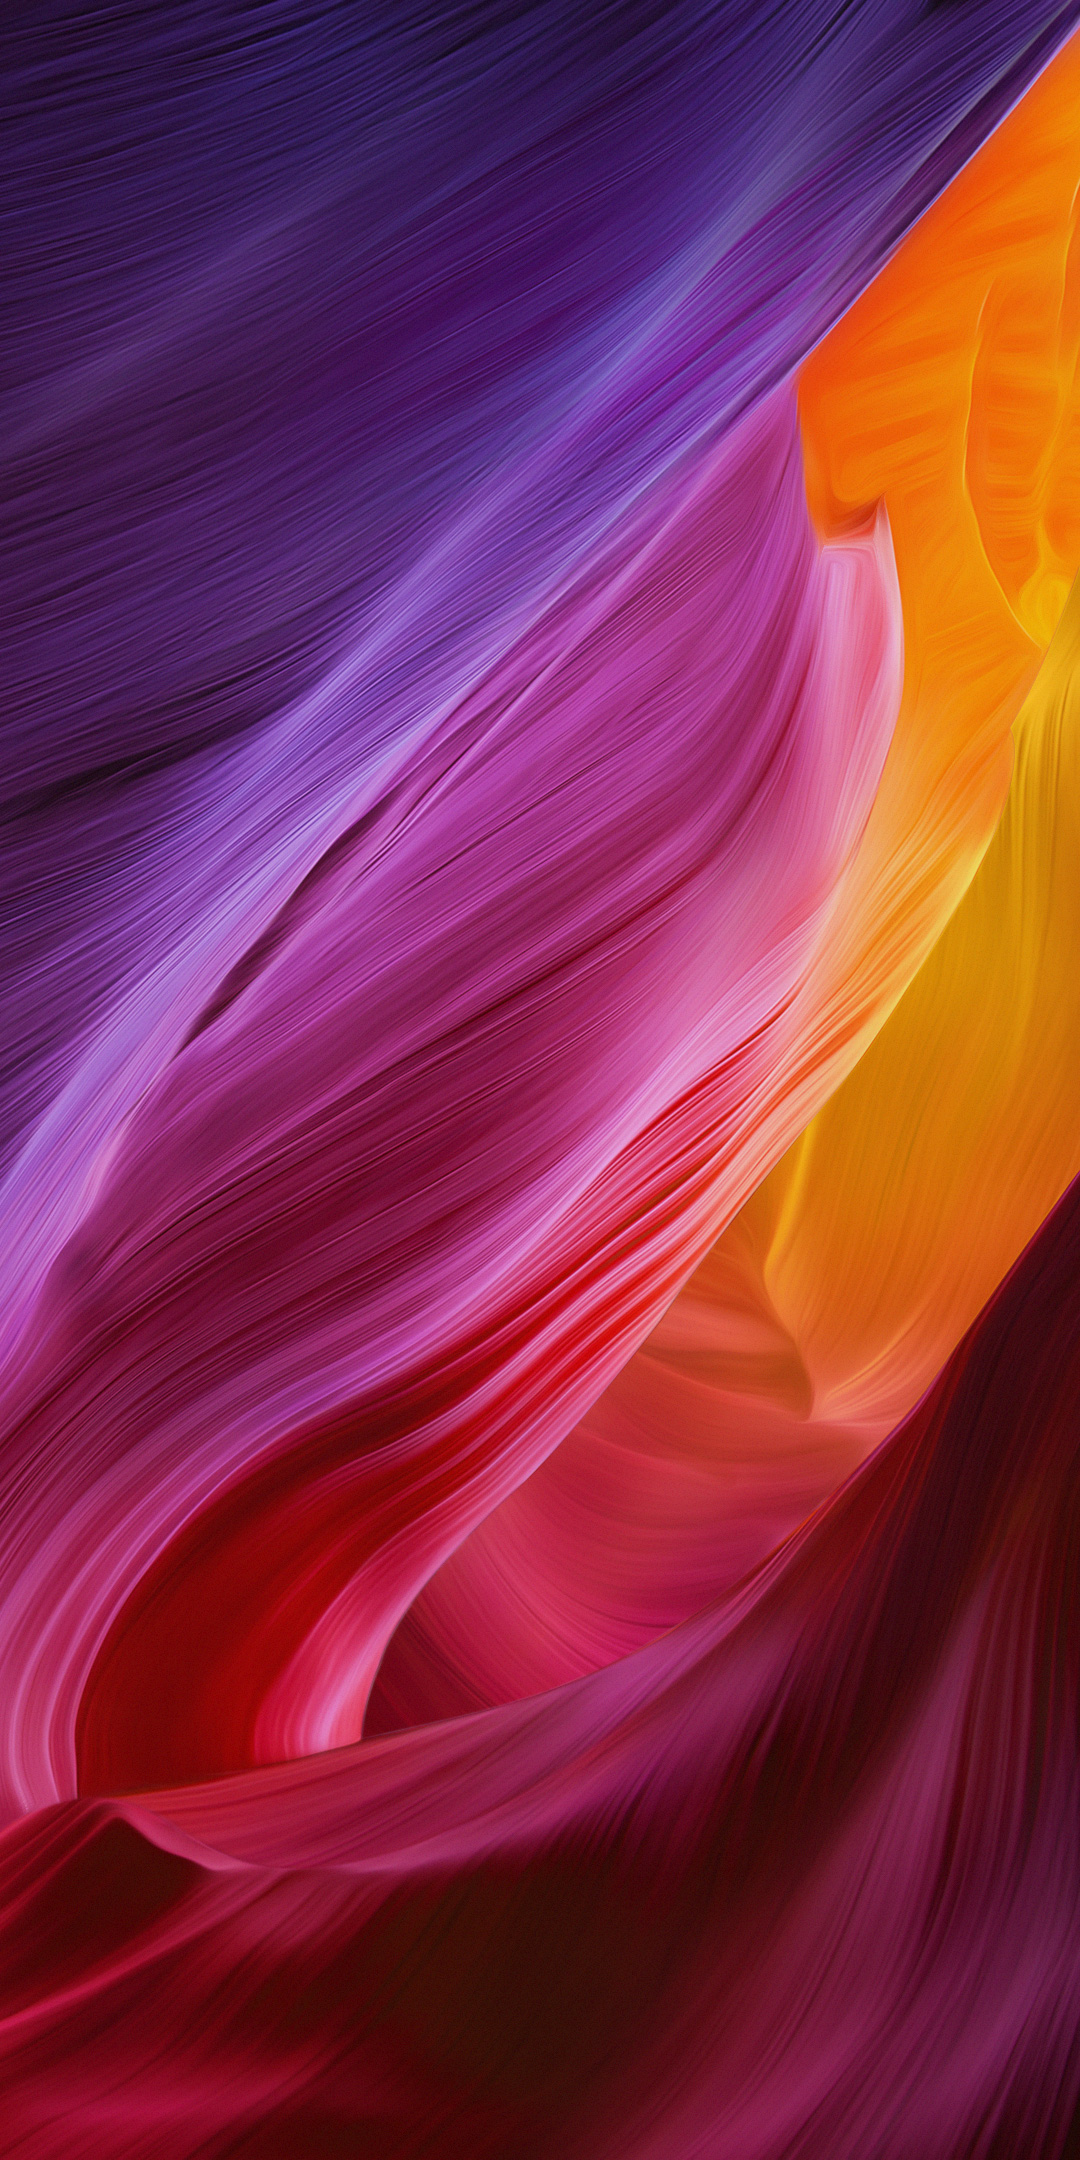 Download MIUI 10 Stock Wallpapers   TechBeasts